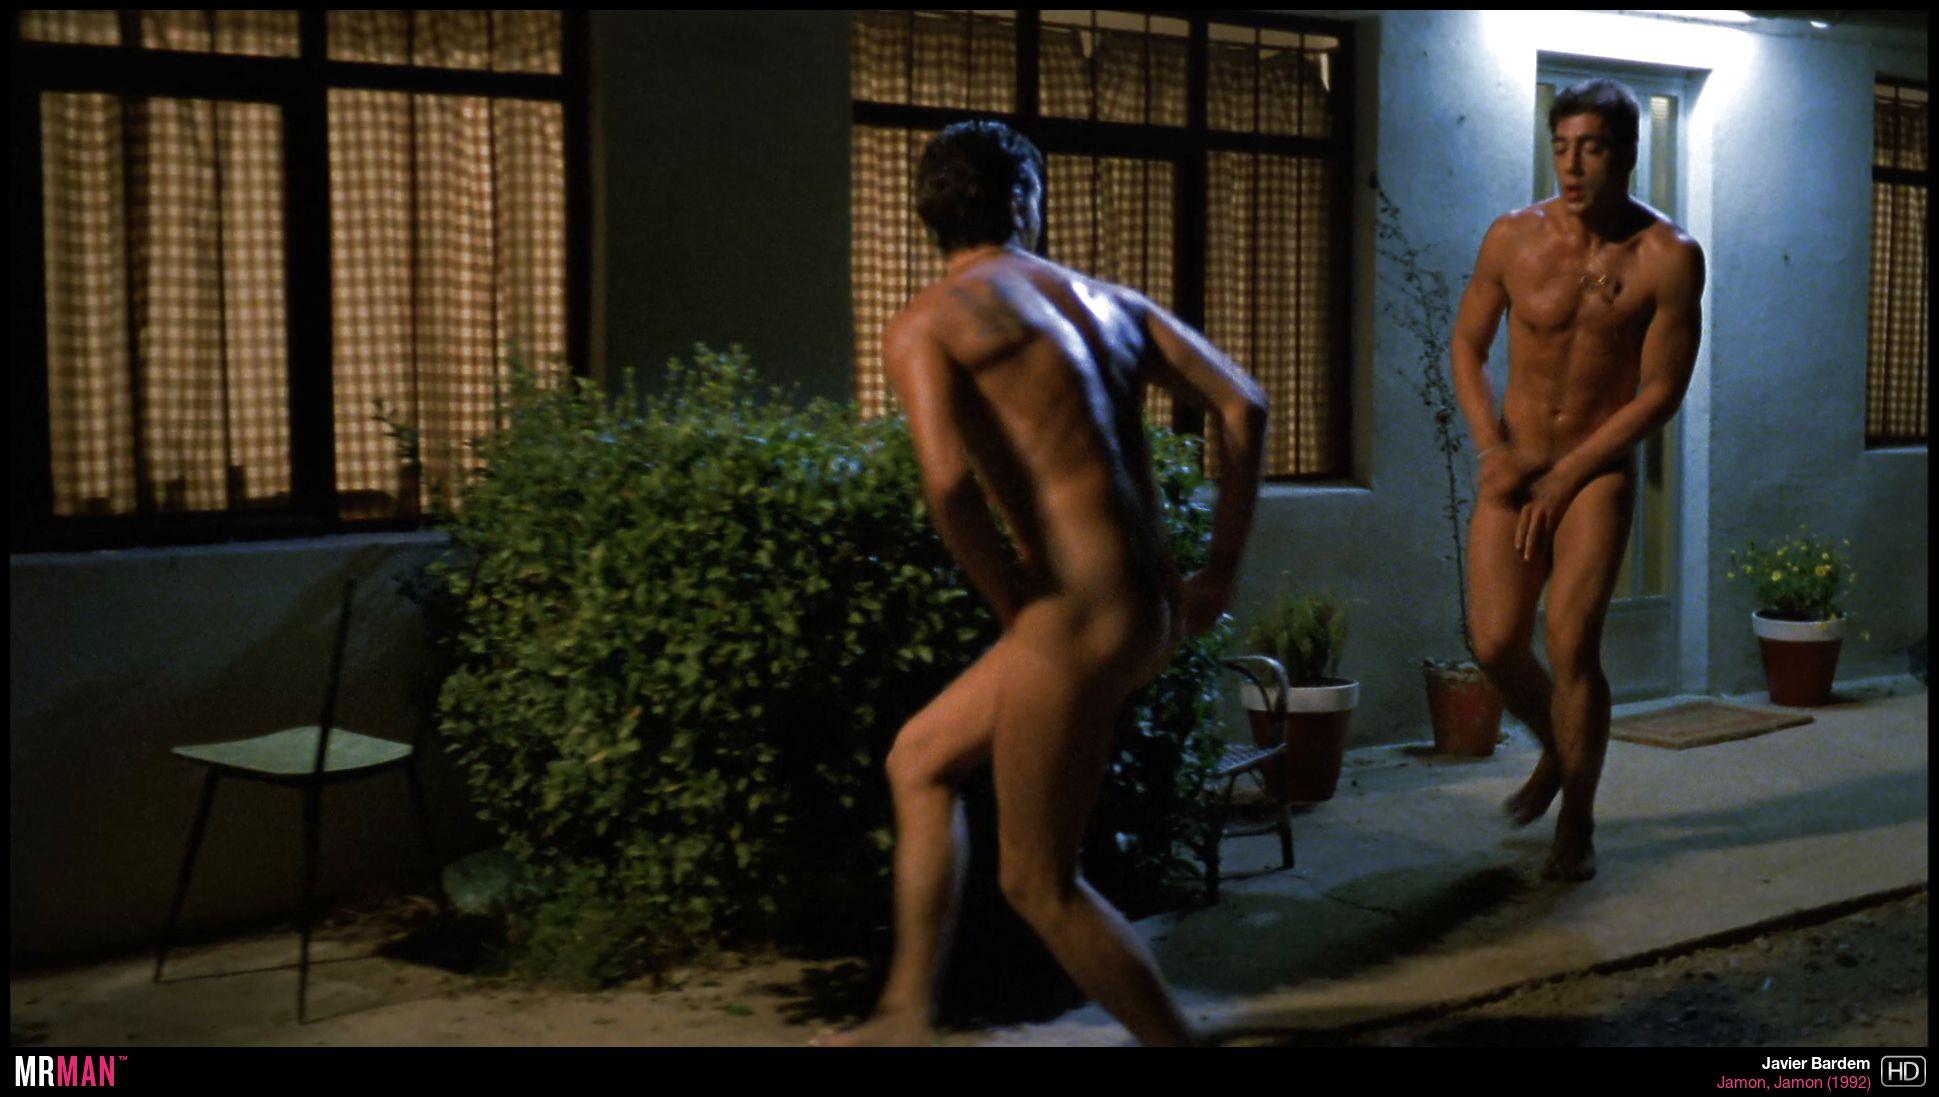 Javier bardem sex scenes 8